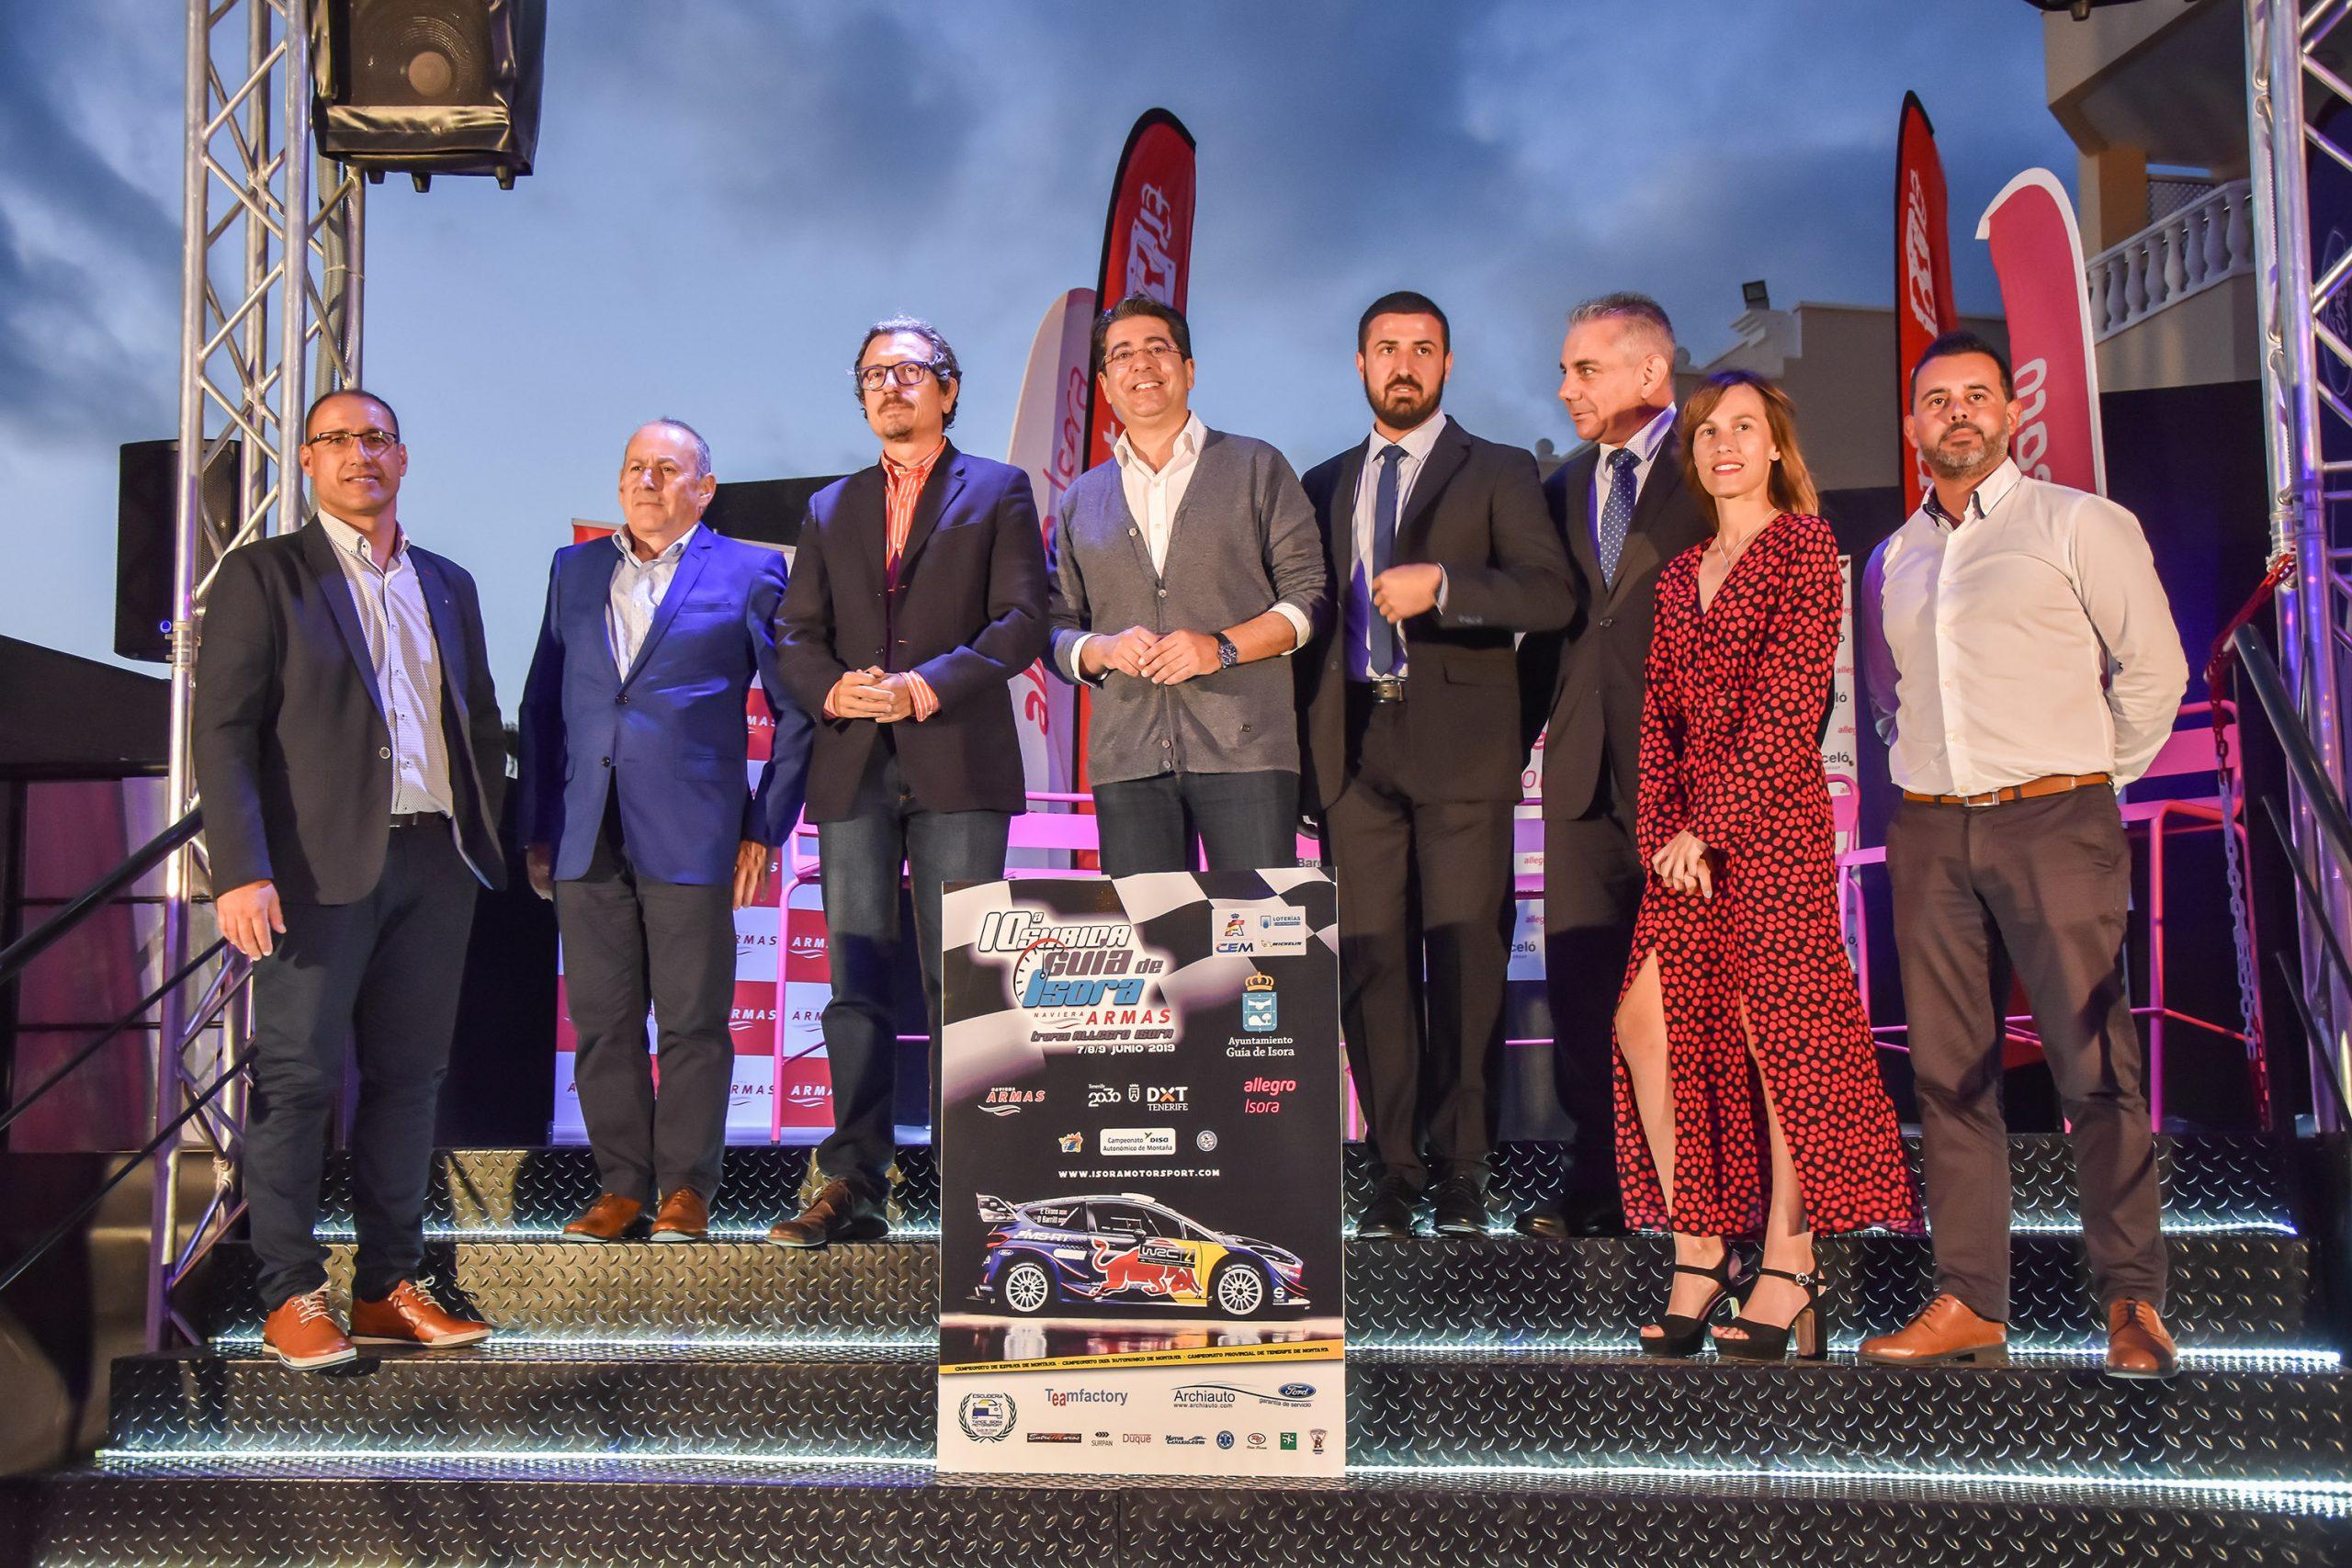 📢 Presentada la 🏁10ª Subida Guía de Isora Naviera Armas 'Trofeo Allegro Isora'.